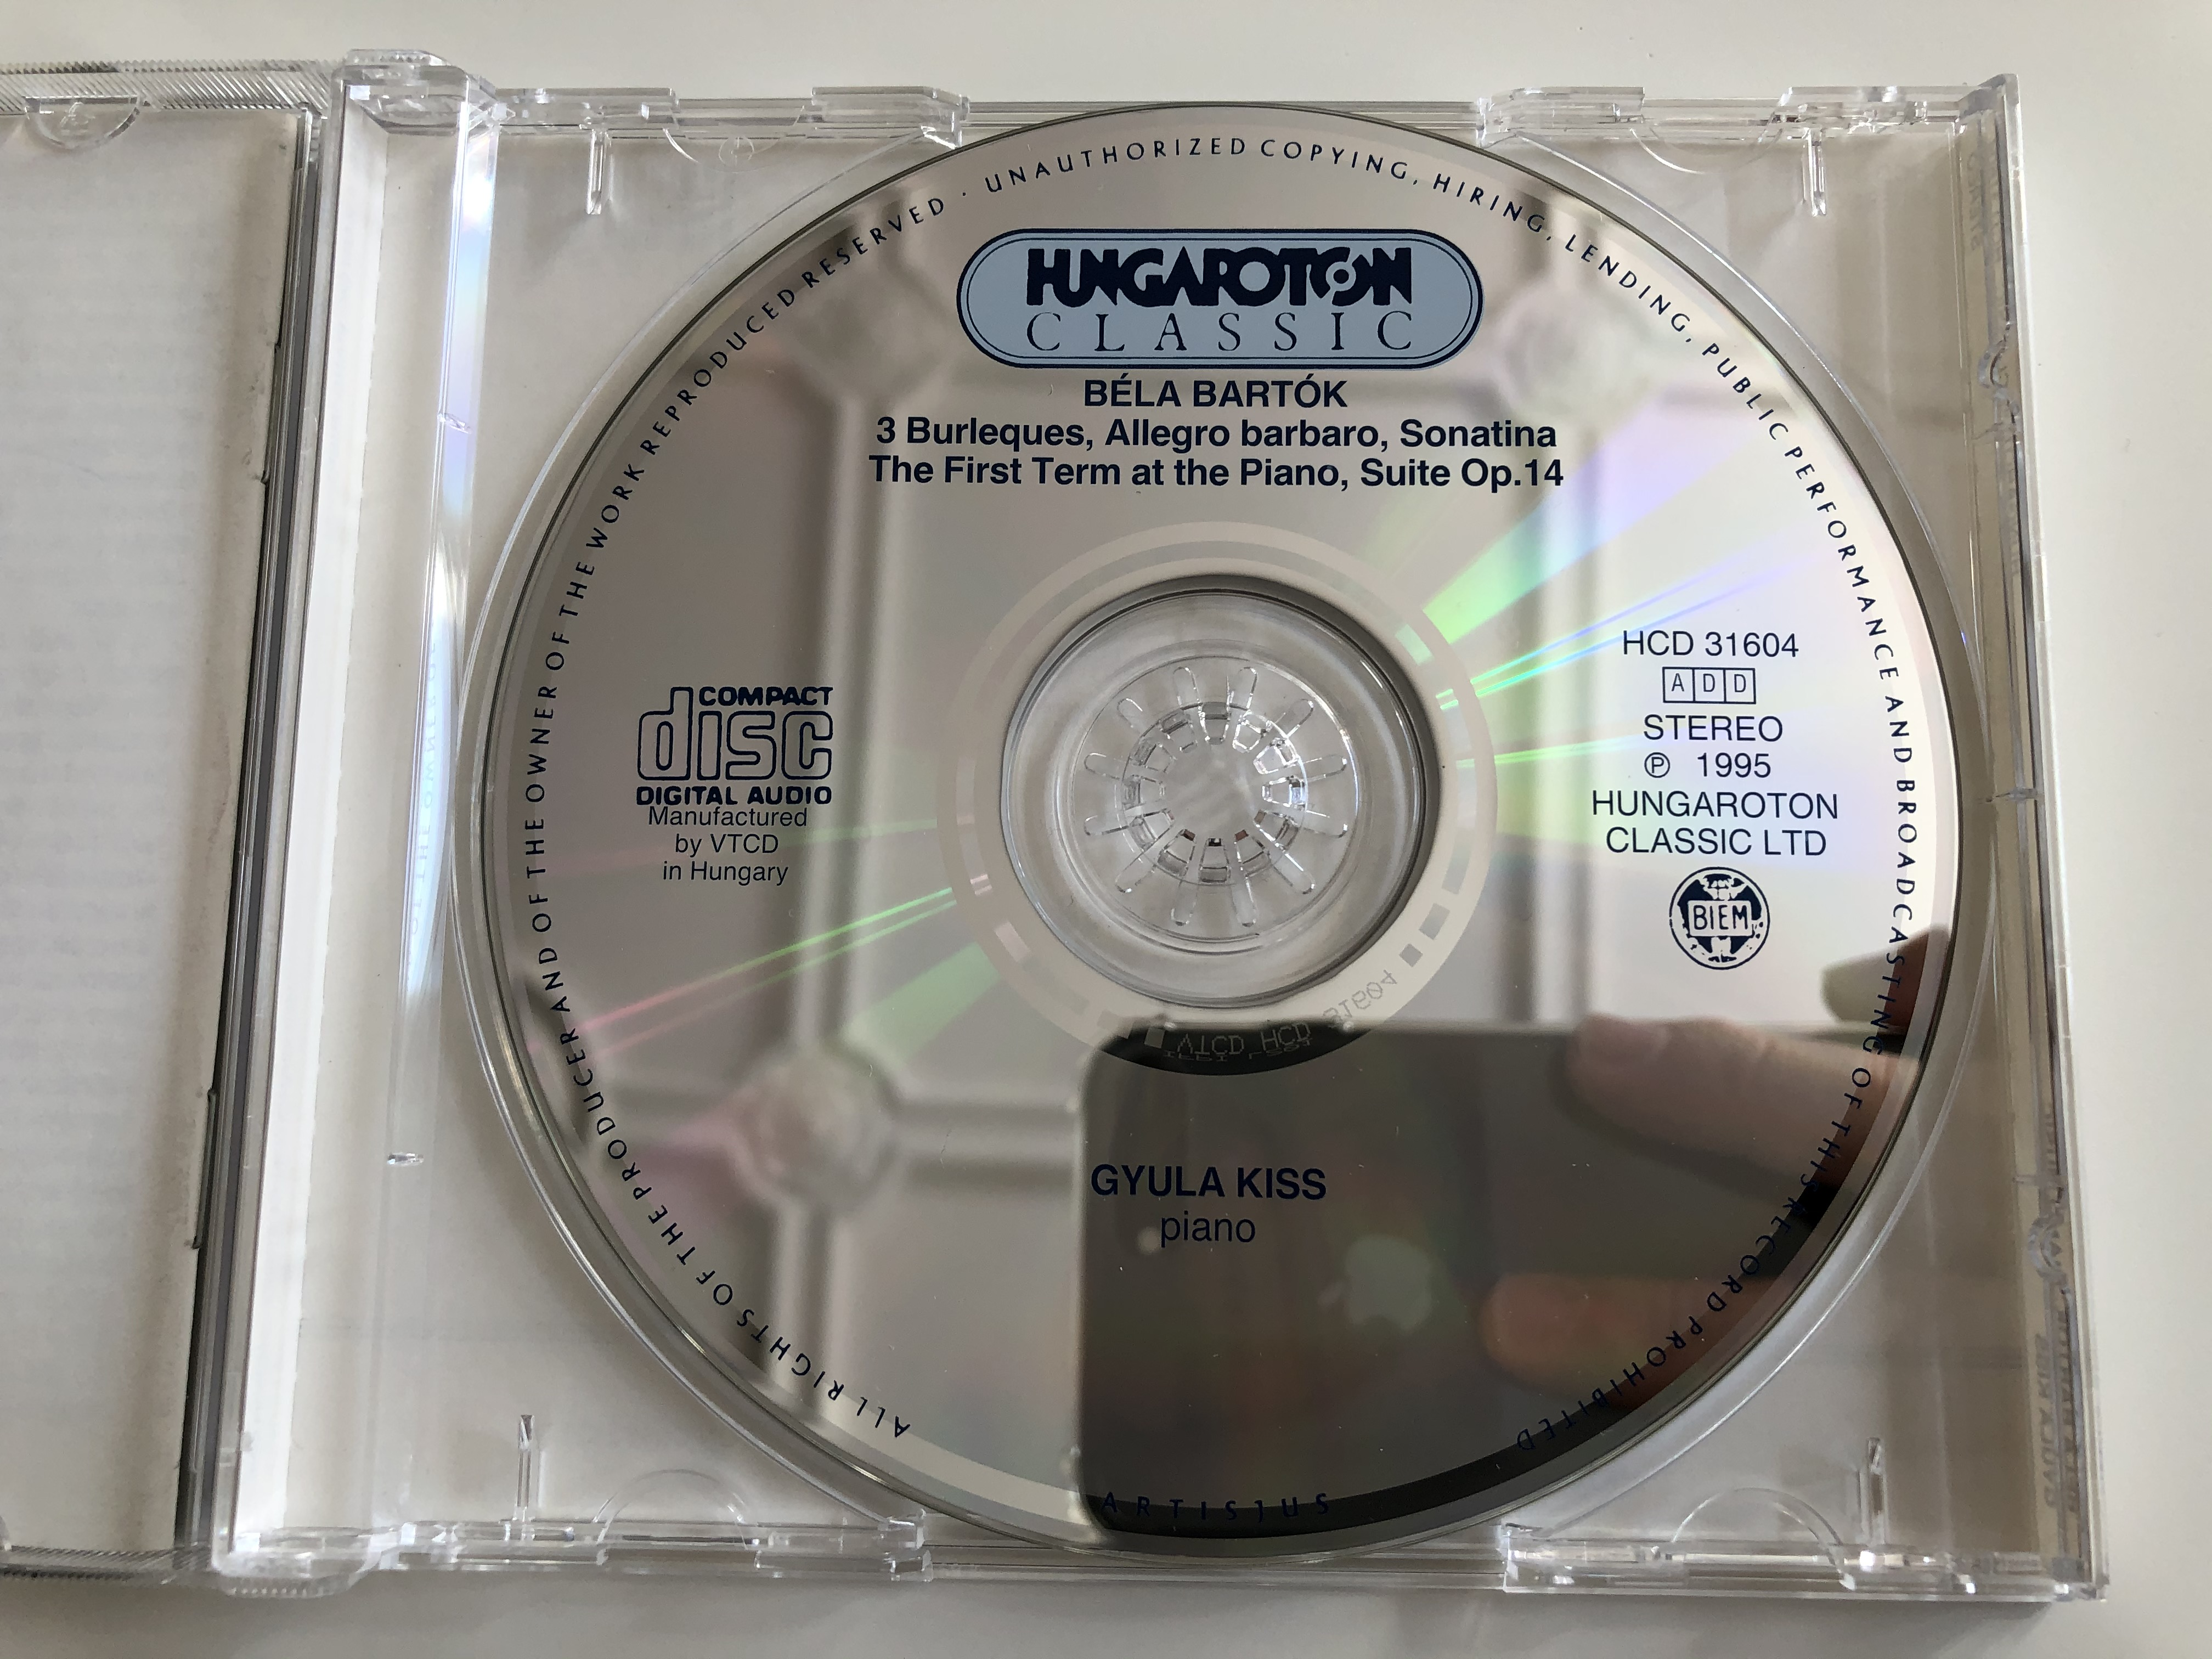 bartok-3-burlesques-allegro-barbaro-sonatina-the-first-term-at-the-piano-suite-op.-14-gyula-kiss-piano-hungaroton-classic-audio-cd-1995-stereo-hcd-31604-7-.jpg